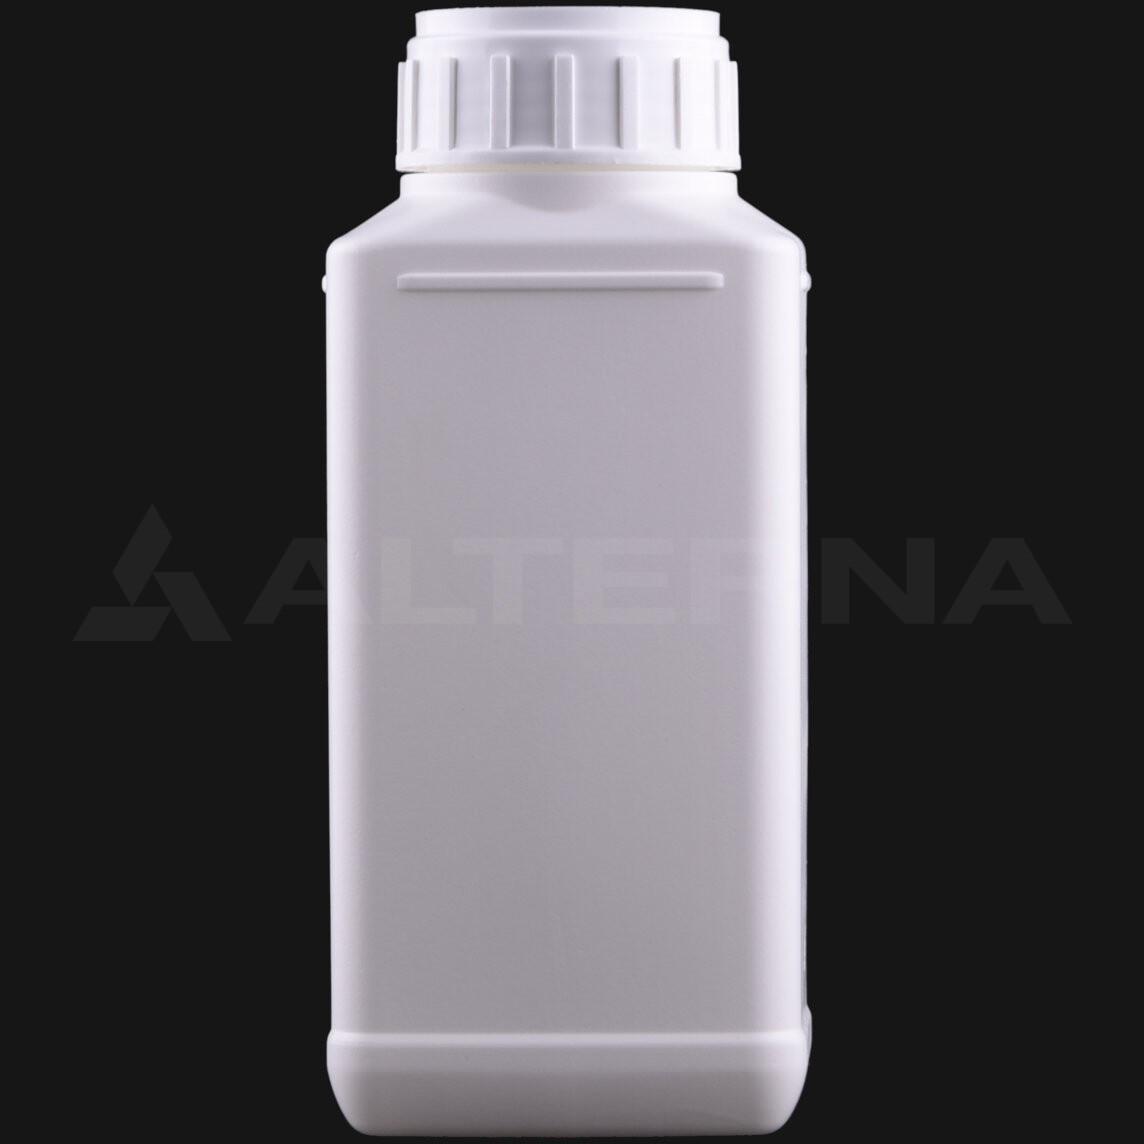 500 ml HDPE Rectangular Bottle with 50 mm Alu. Foil Seal Cap